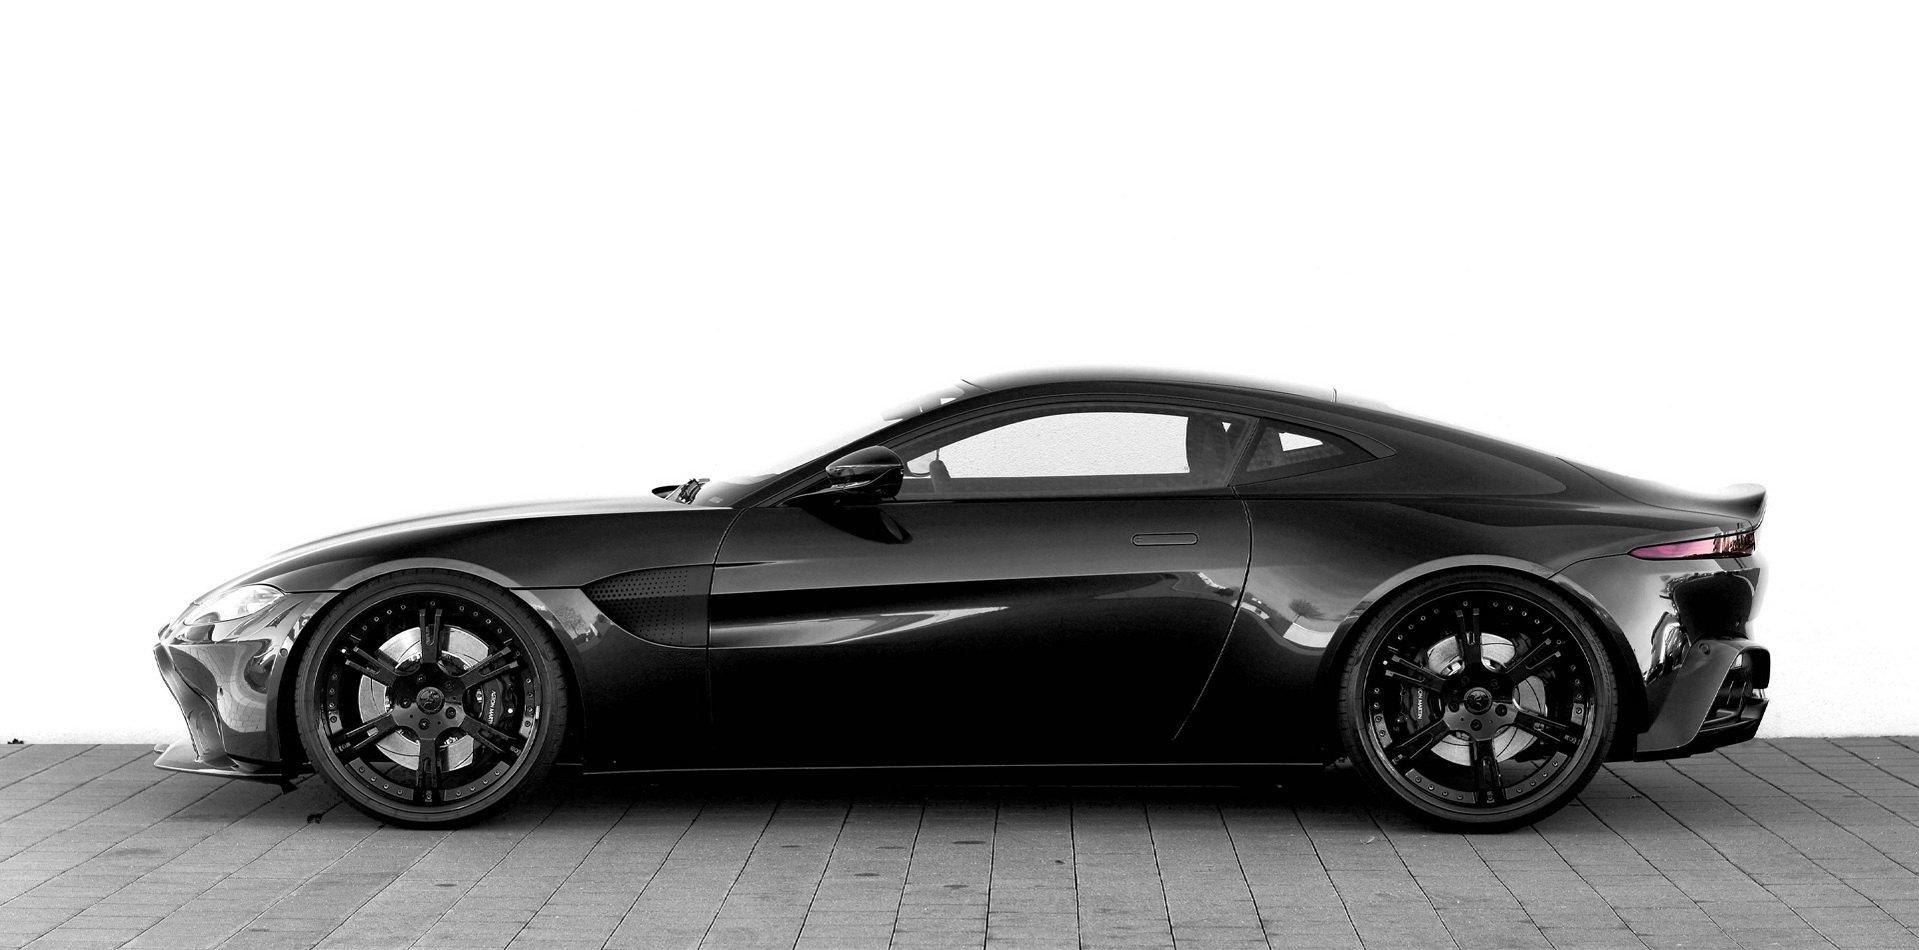 Aston Martin Vantage by wheelsandmore (7)